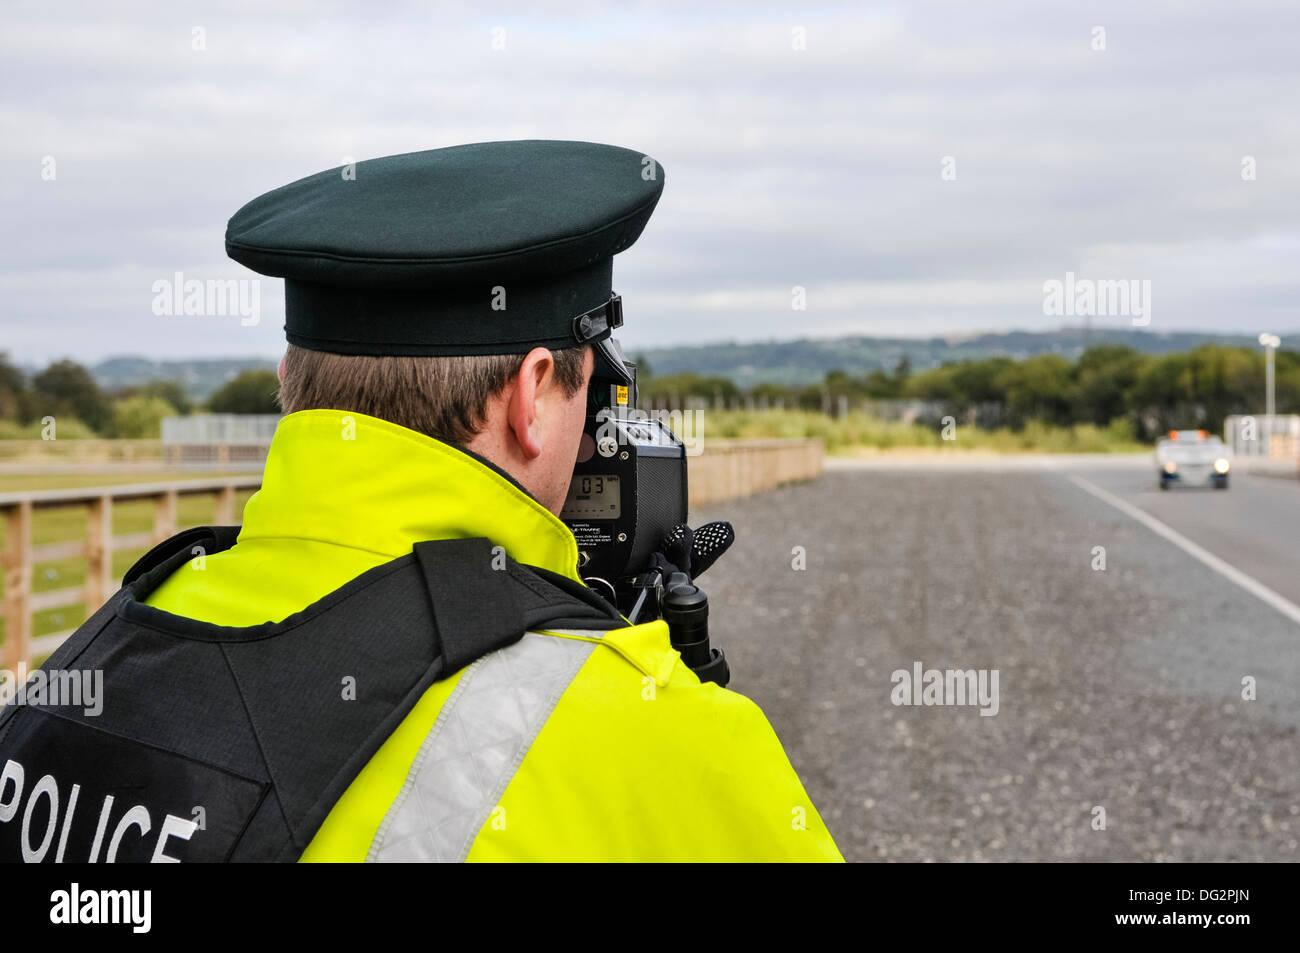 Police officer uses a Laser Technology Inc UltraLyte laser speed detector gun - Stock Image